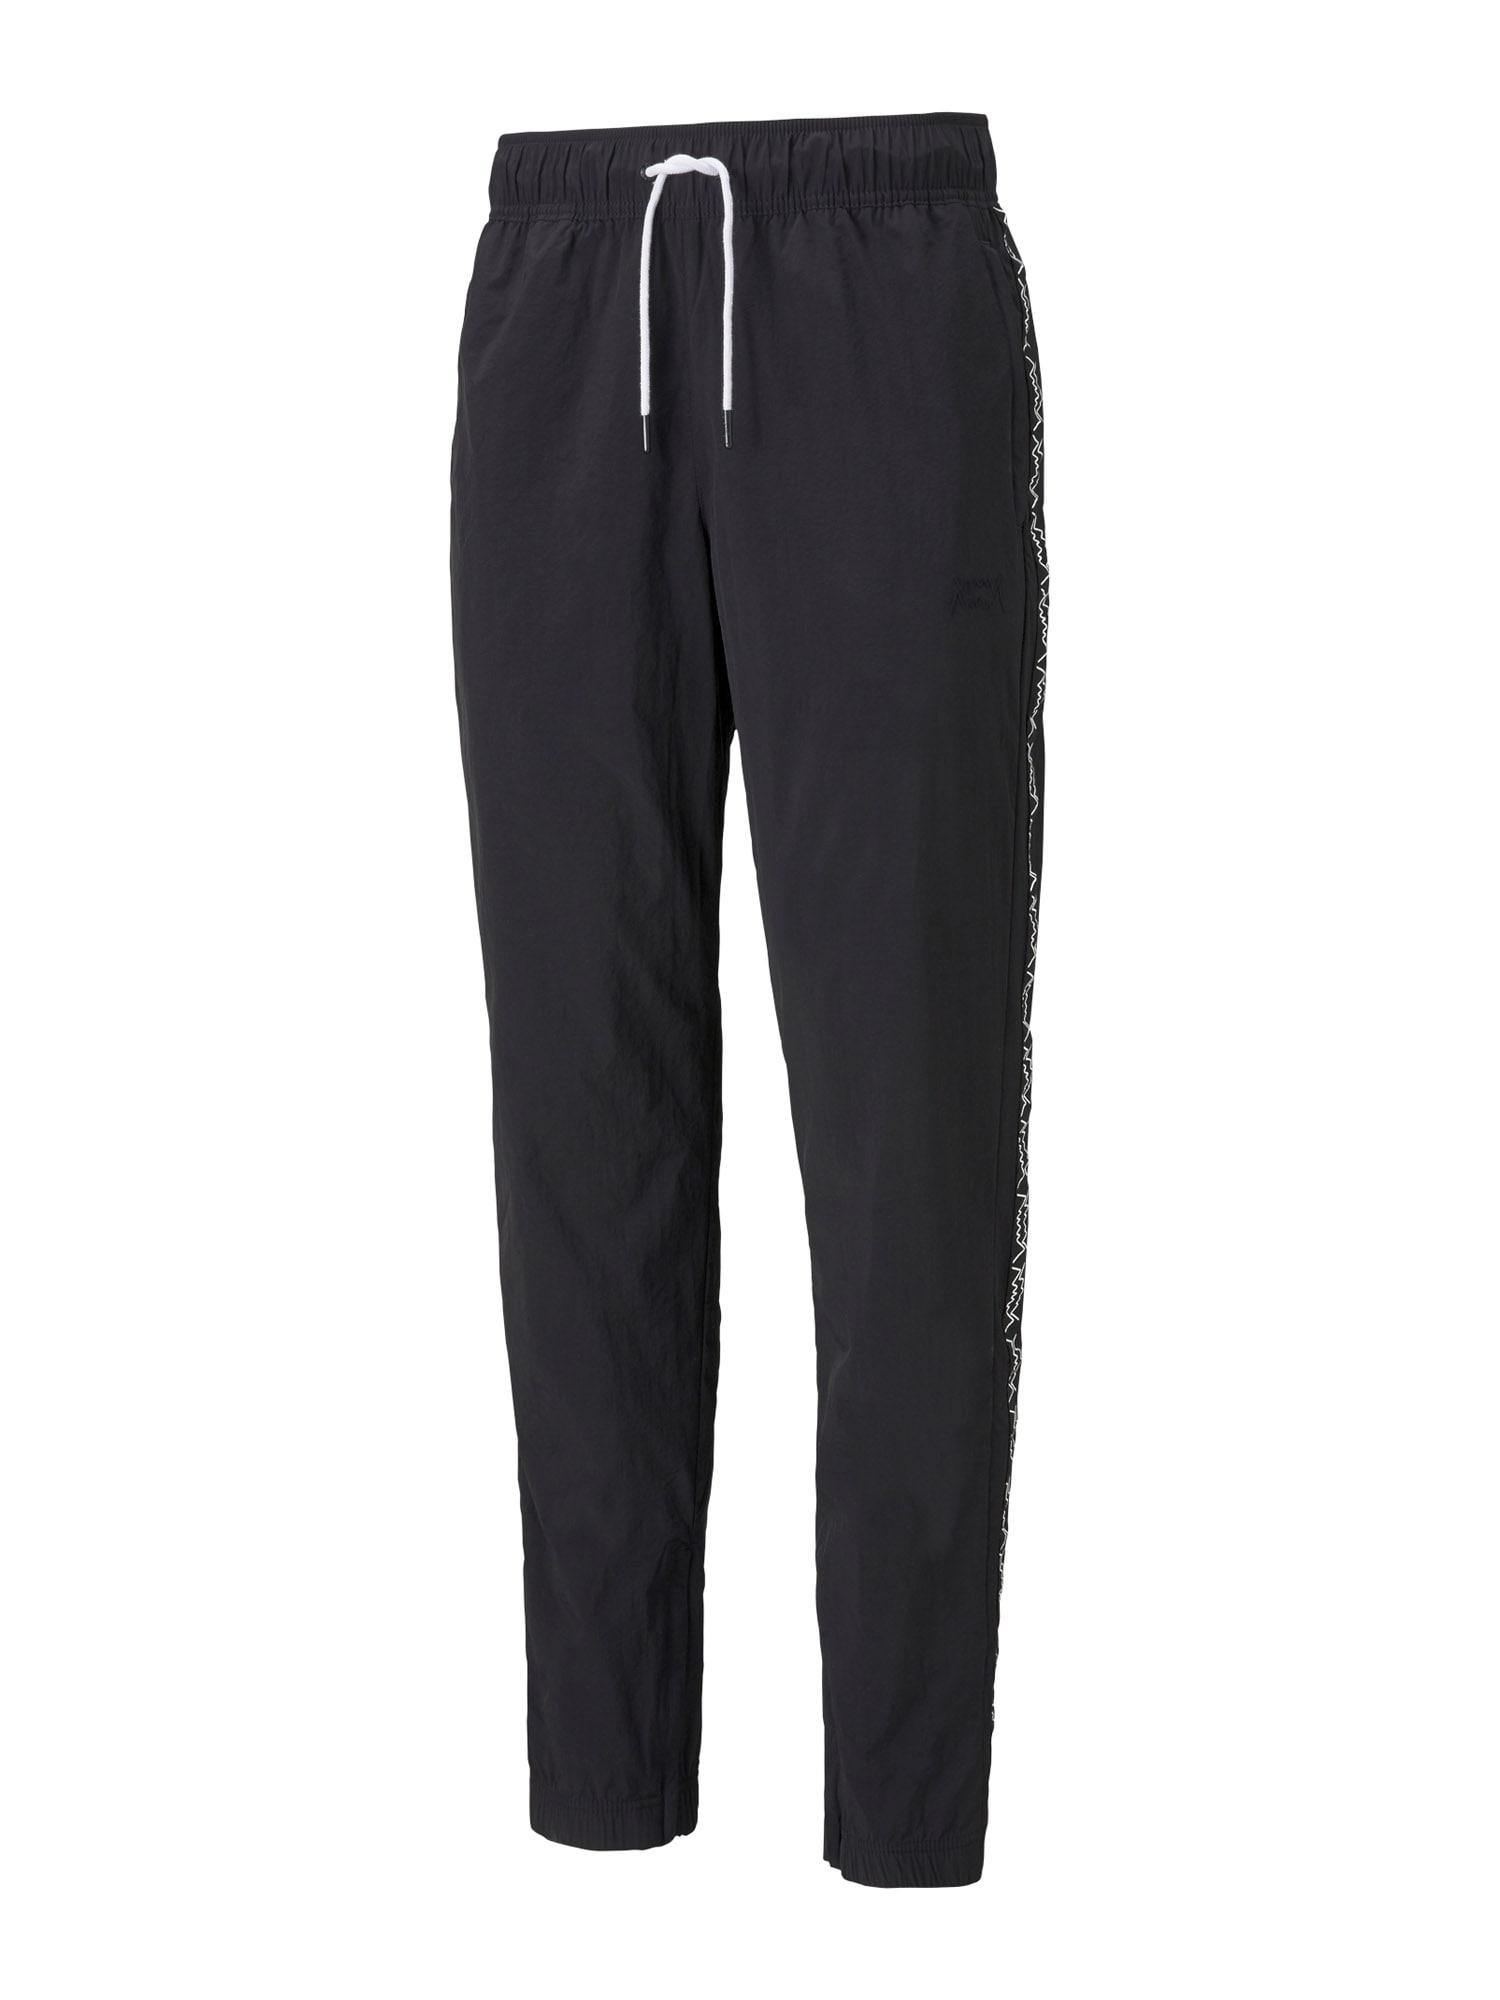 PUMA Pantaloni sportivi 'Prospect'  nero / bianco male shop the look